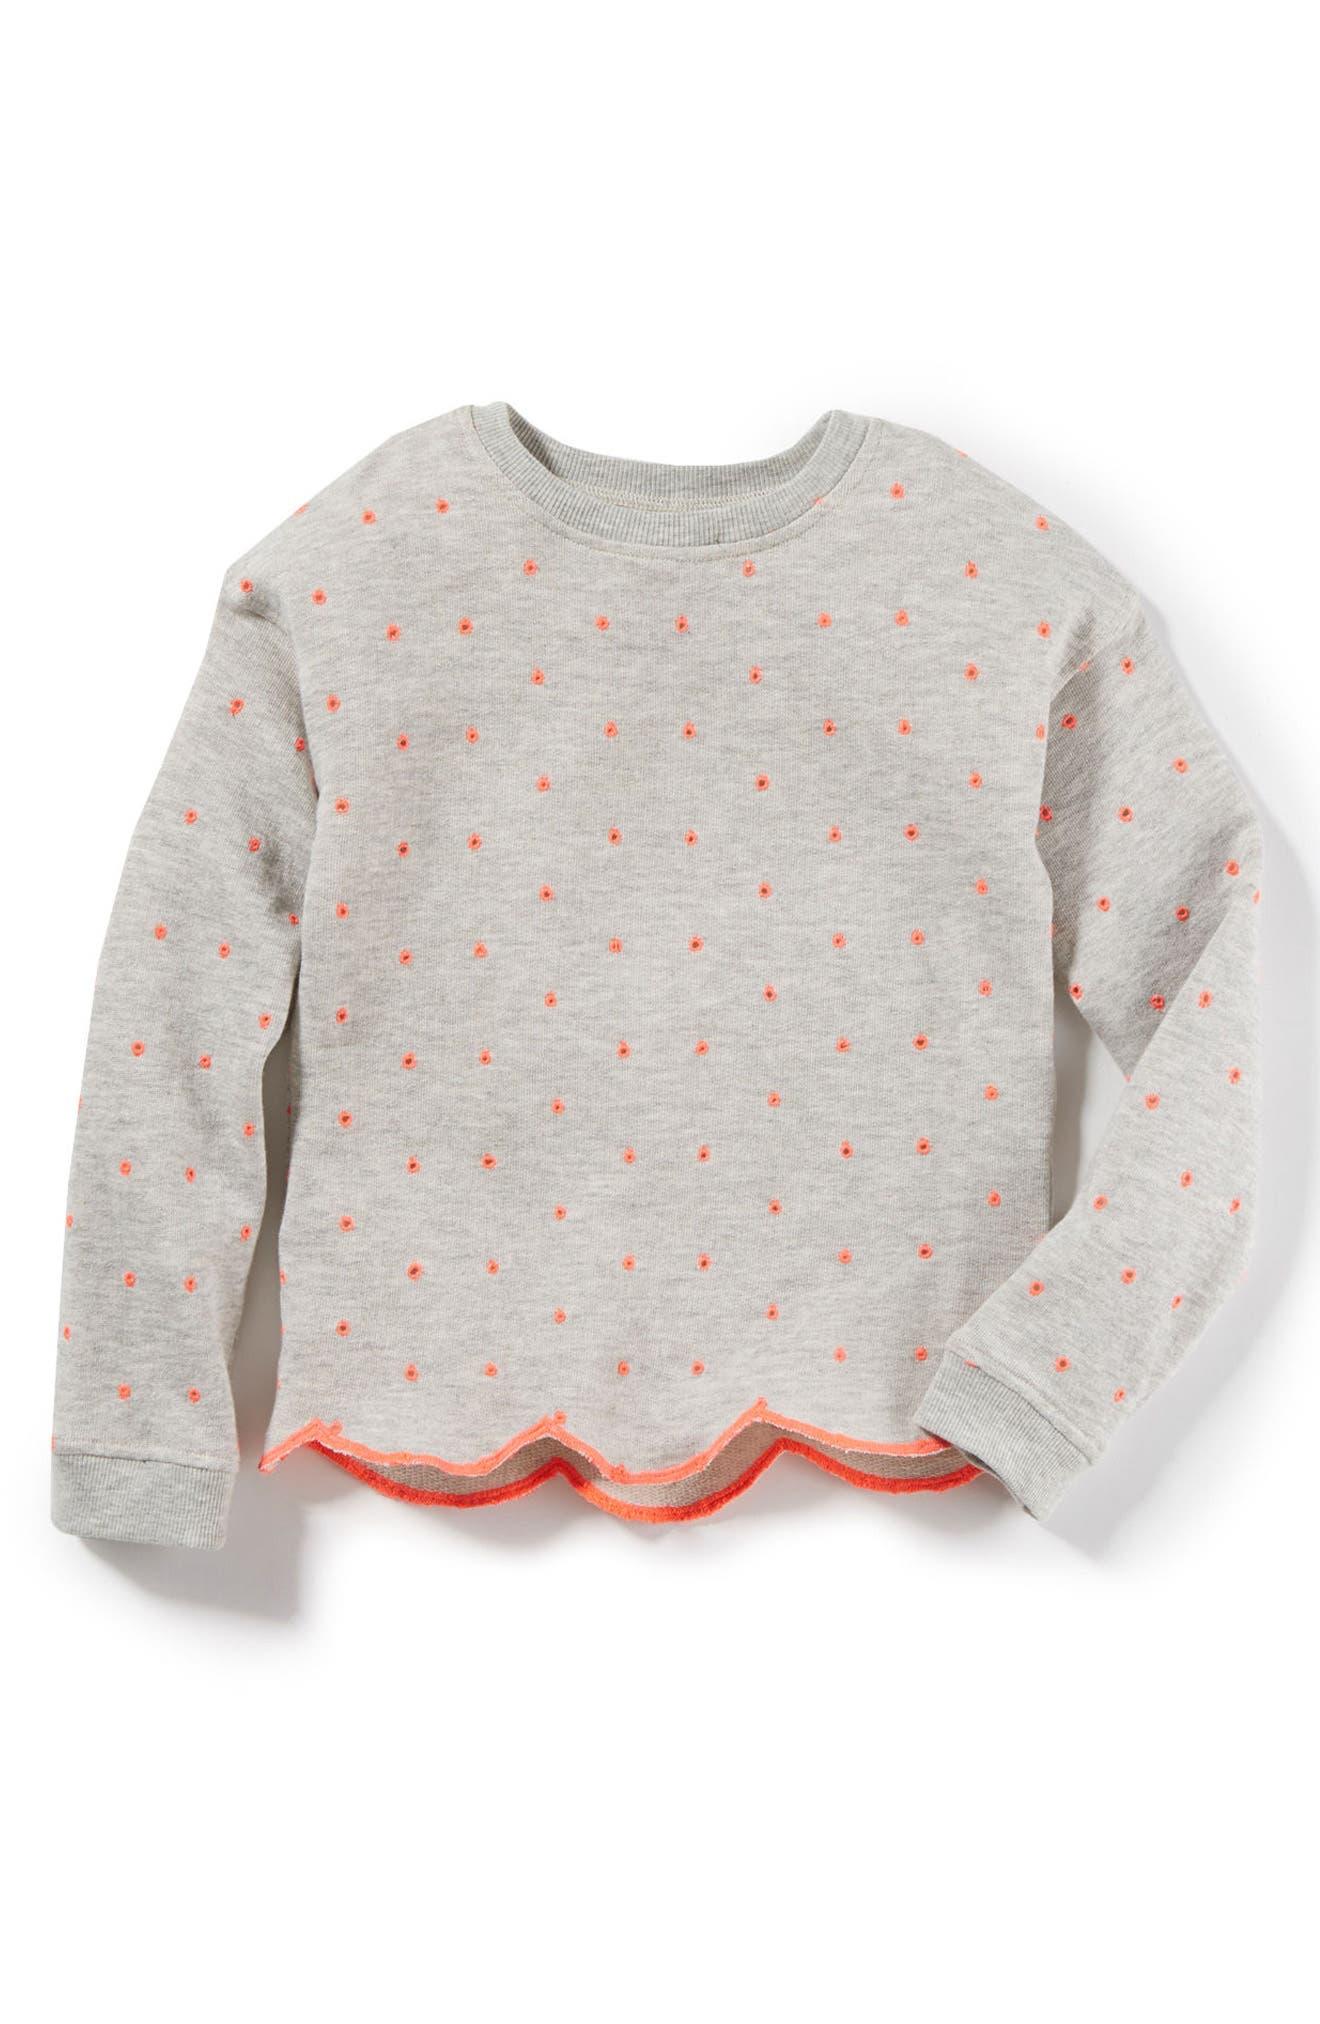 Ariel Sweater,                             Main thumbnail 1, color,                             Heather Grey